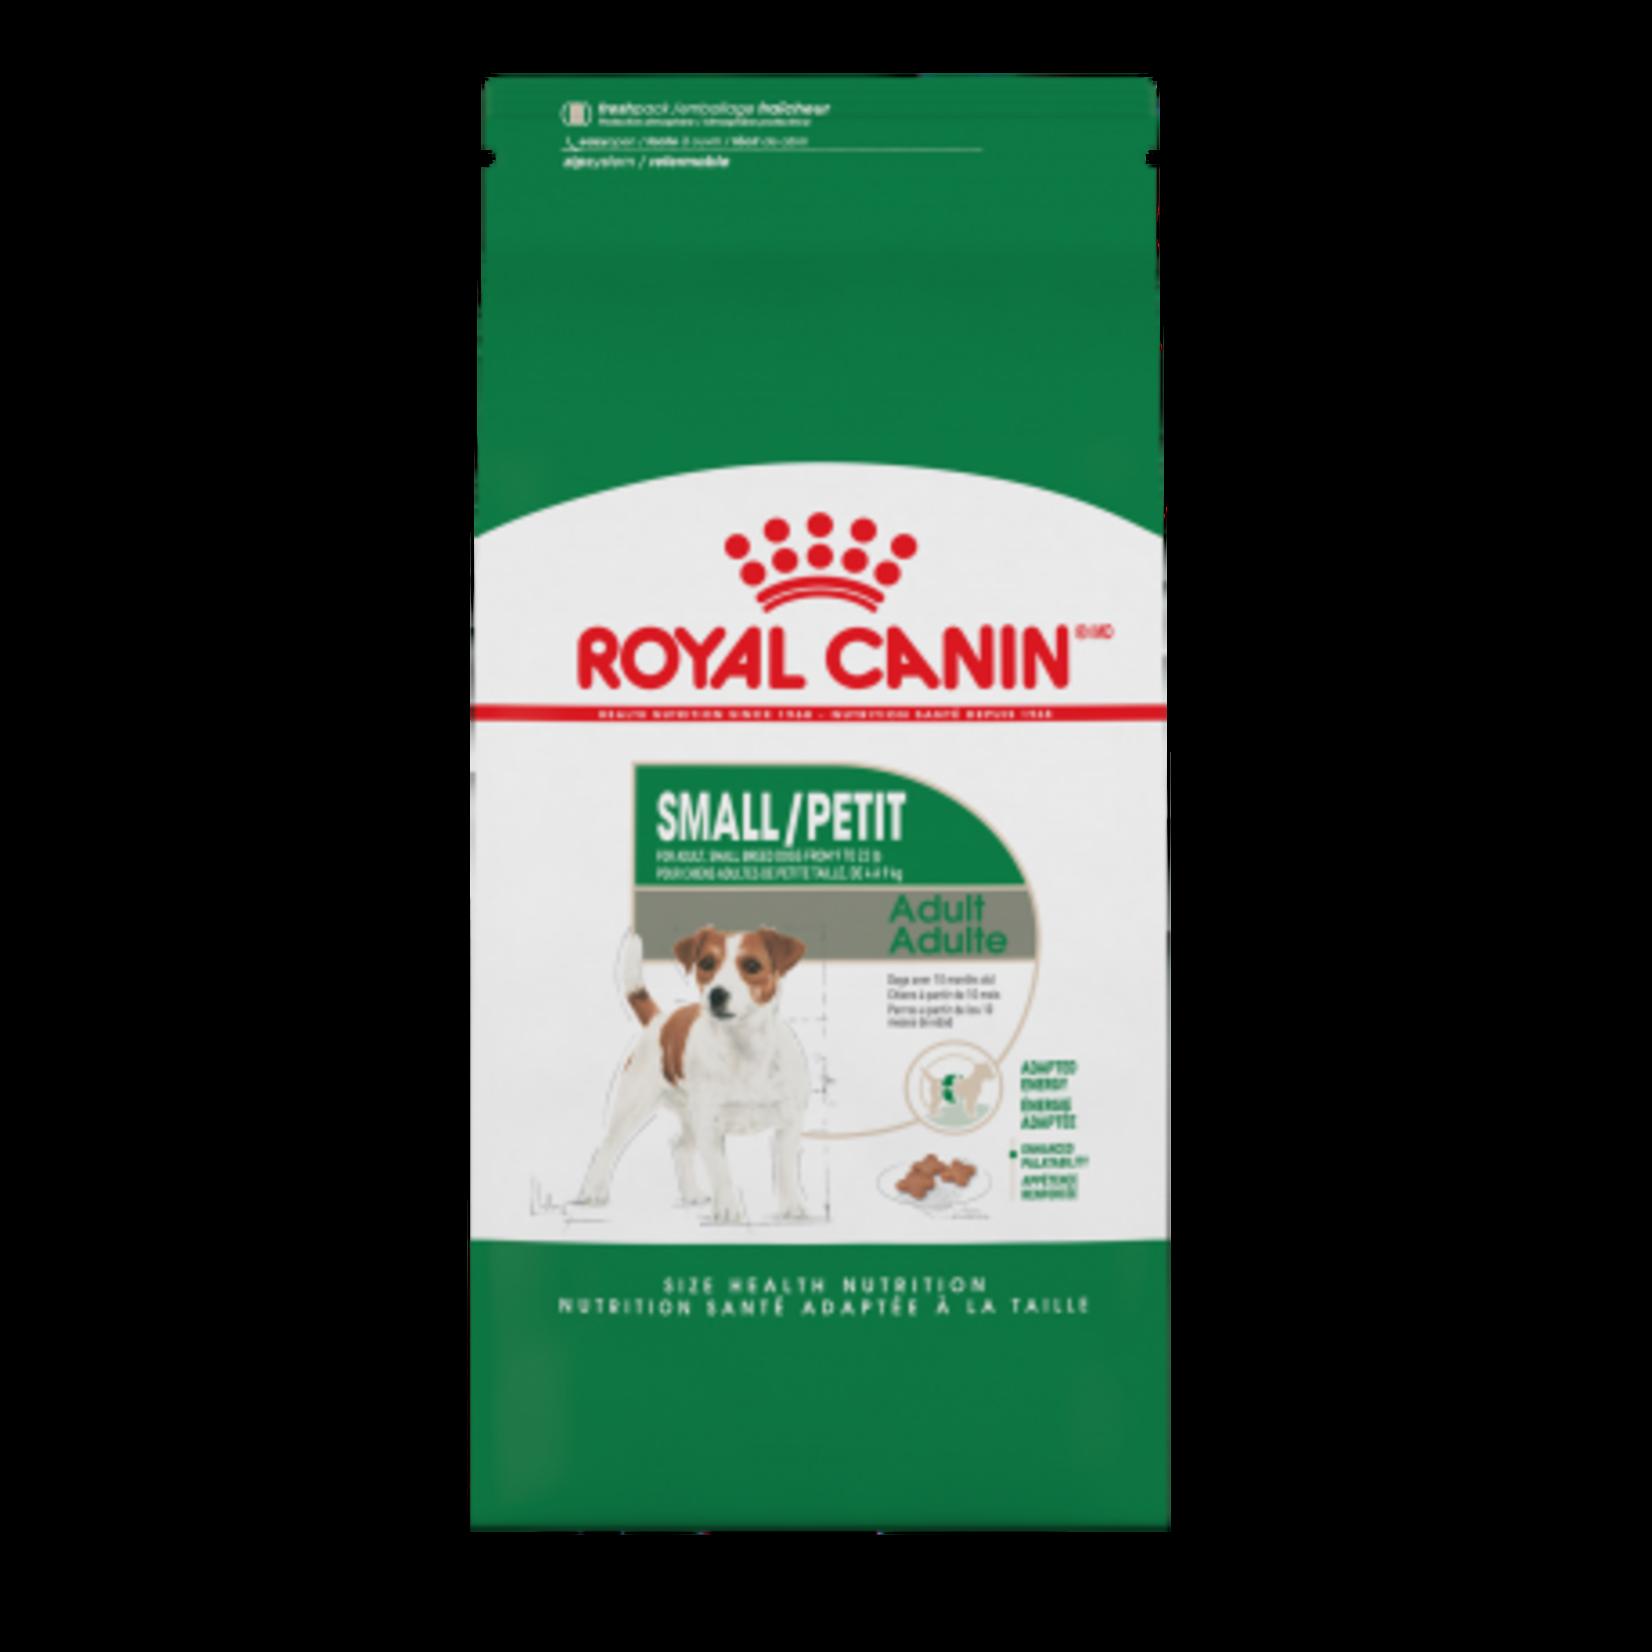 Royal Canin Small Adult 4.4lb